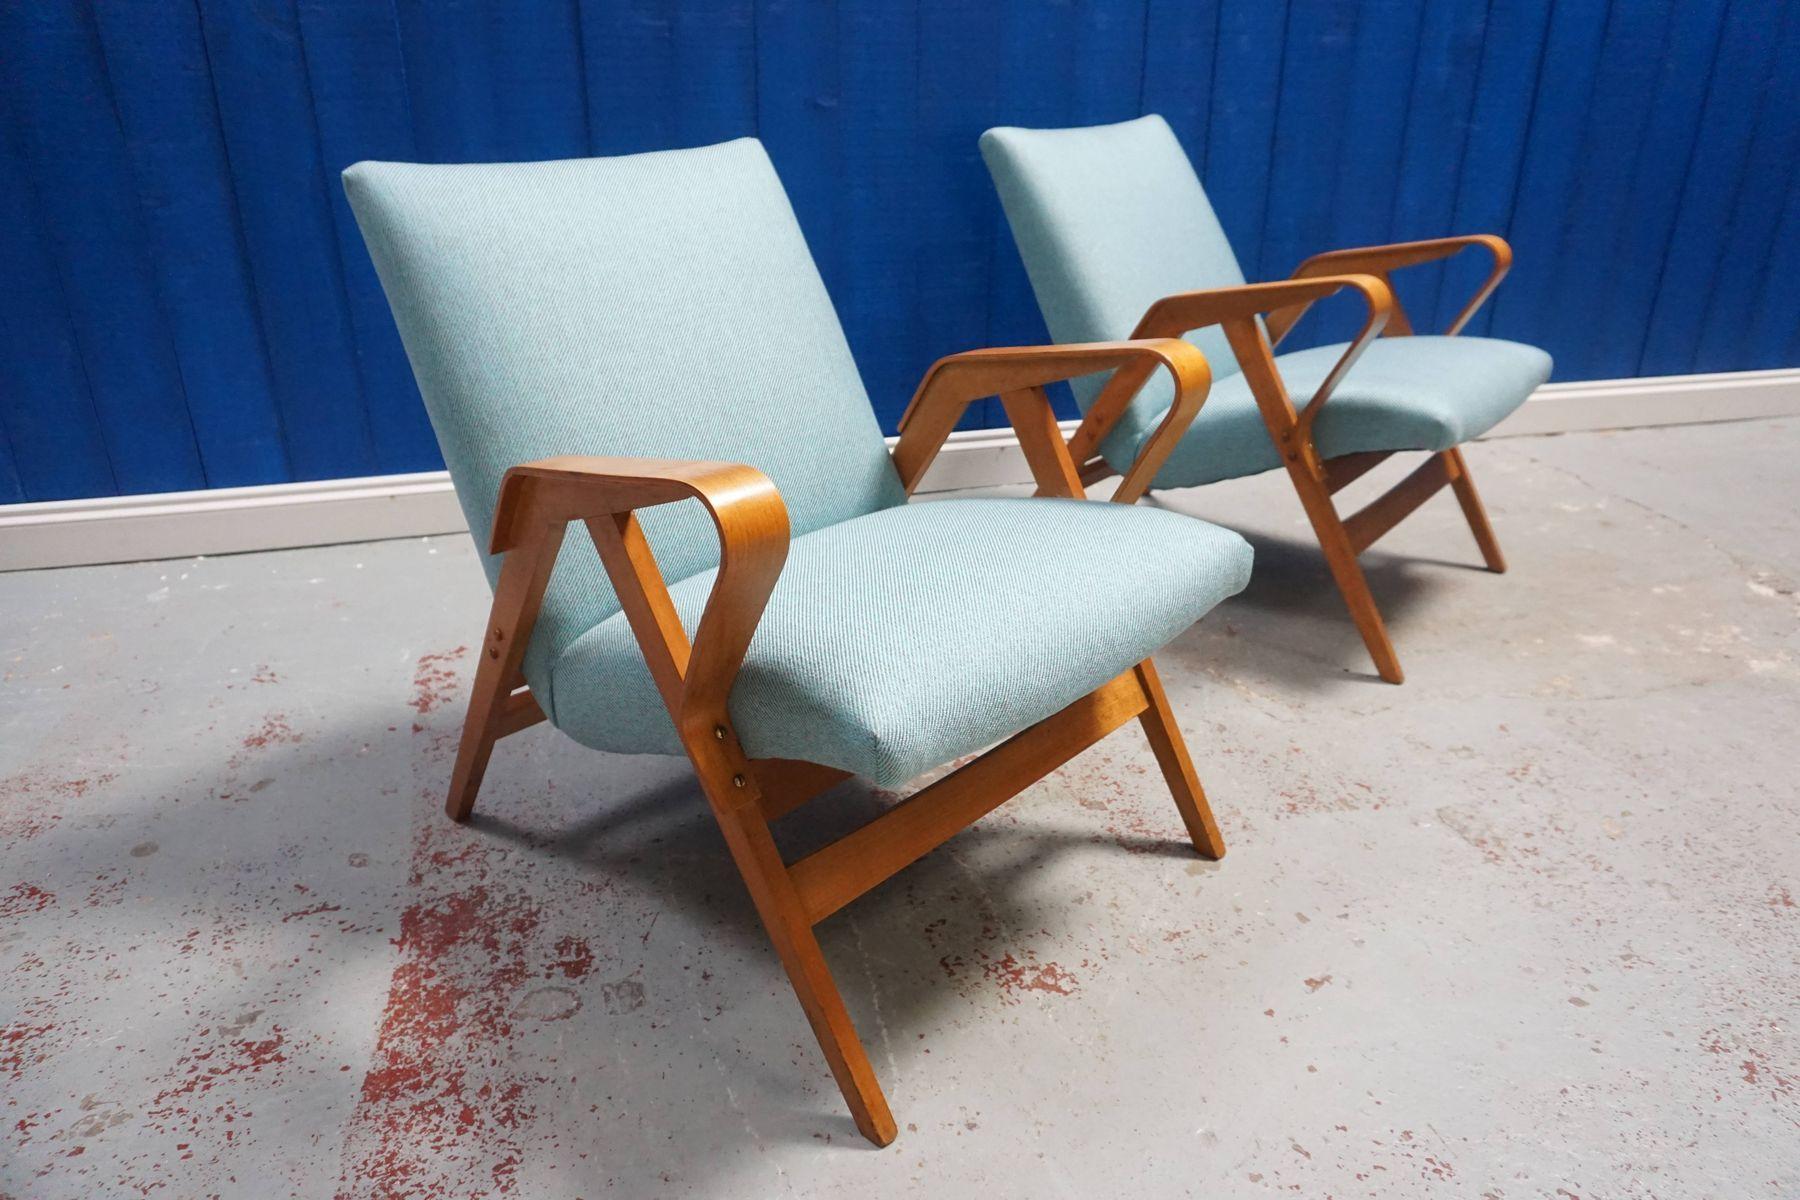 Sessel Bequem Design Sessel Billig Kaufen Stressless Sofa